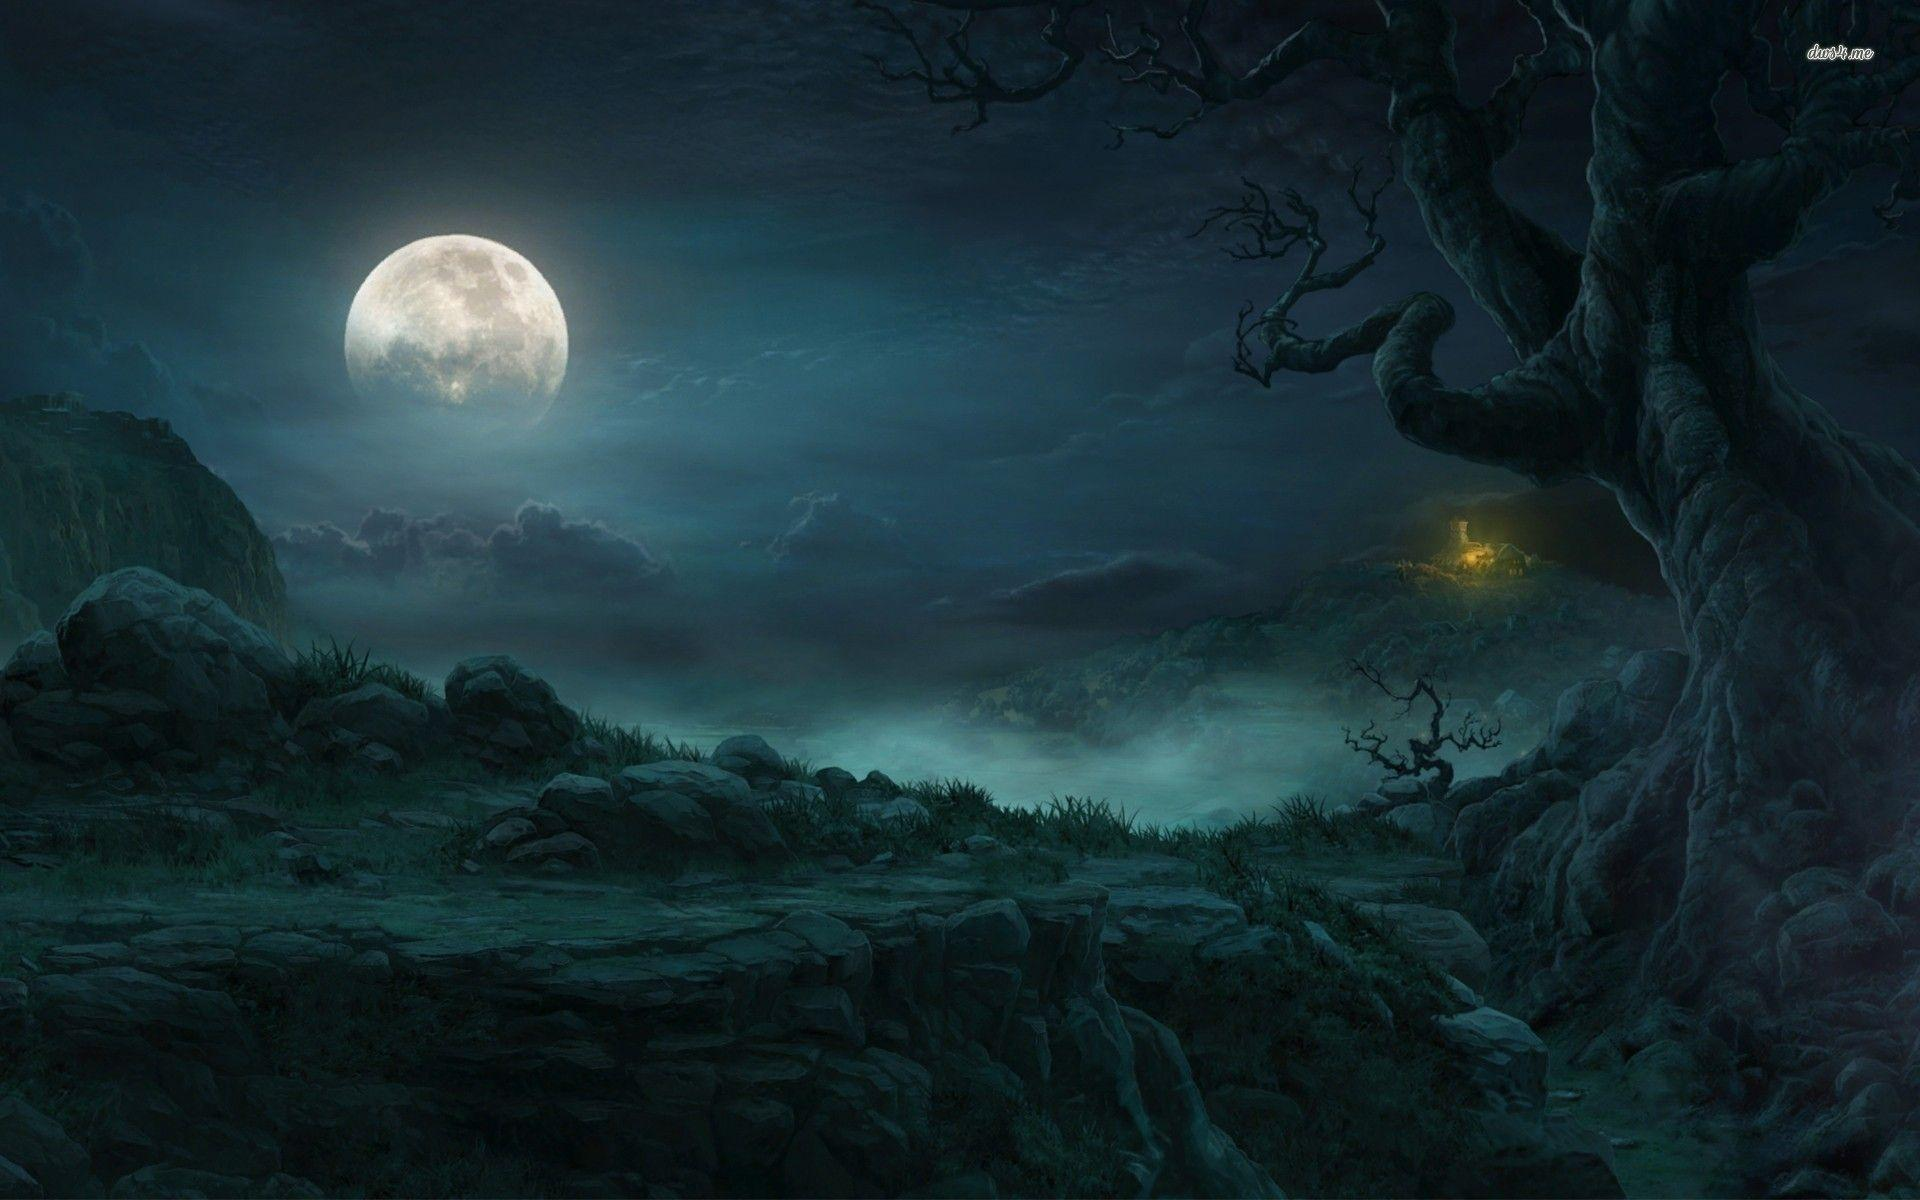 Moon Hd Wallpaper 1080p